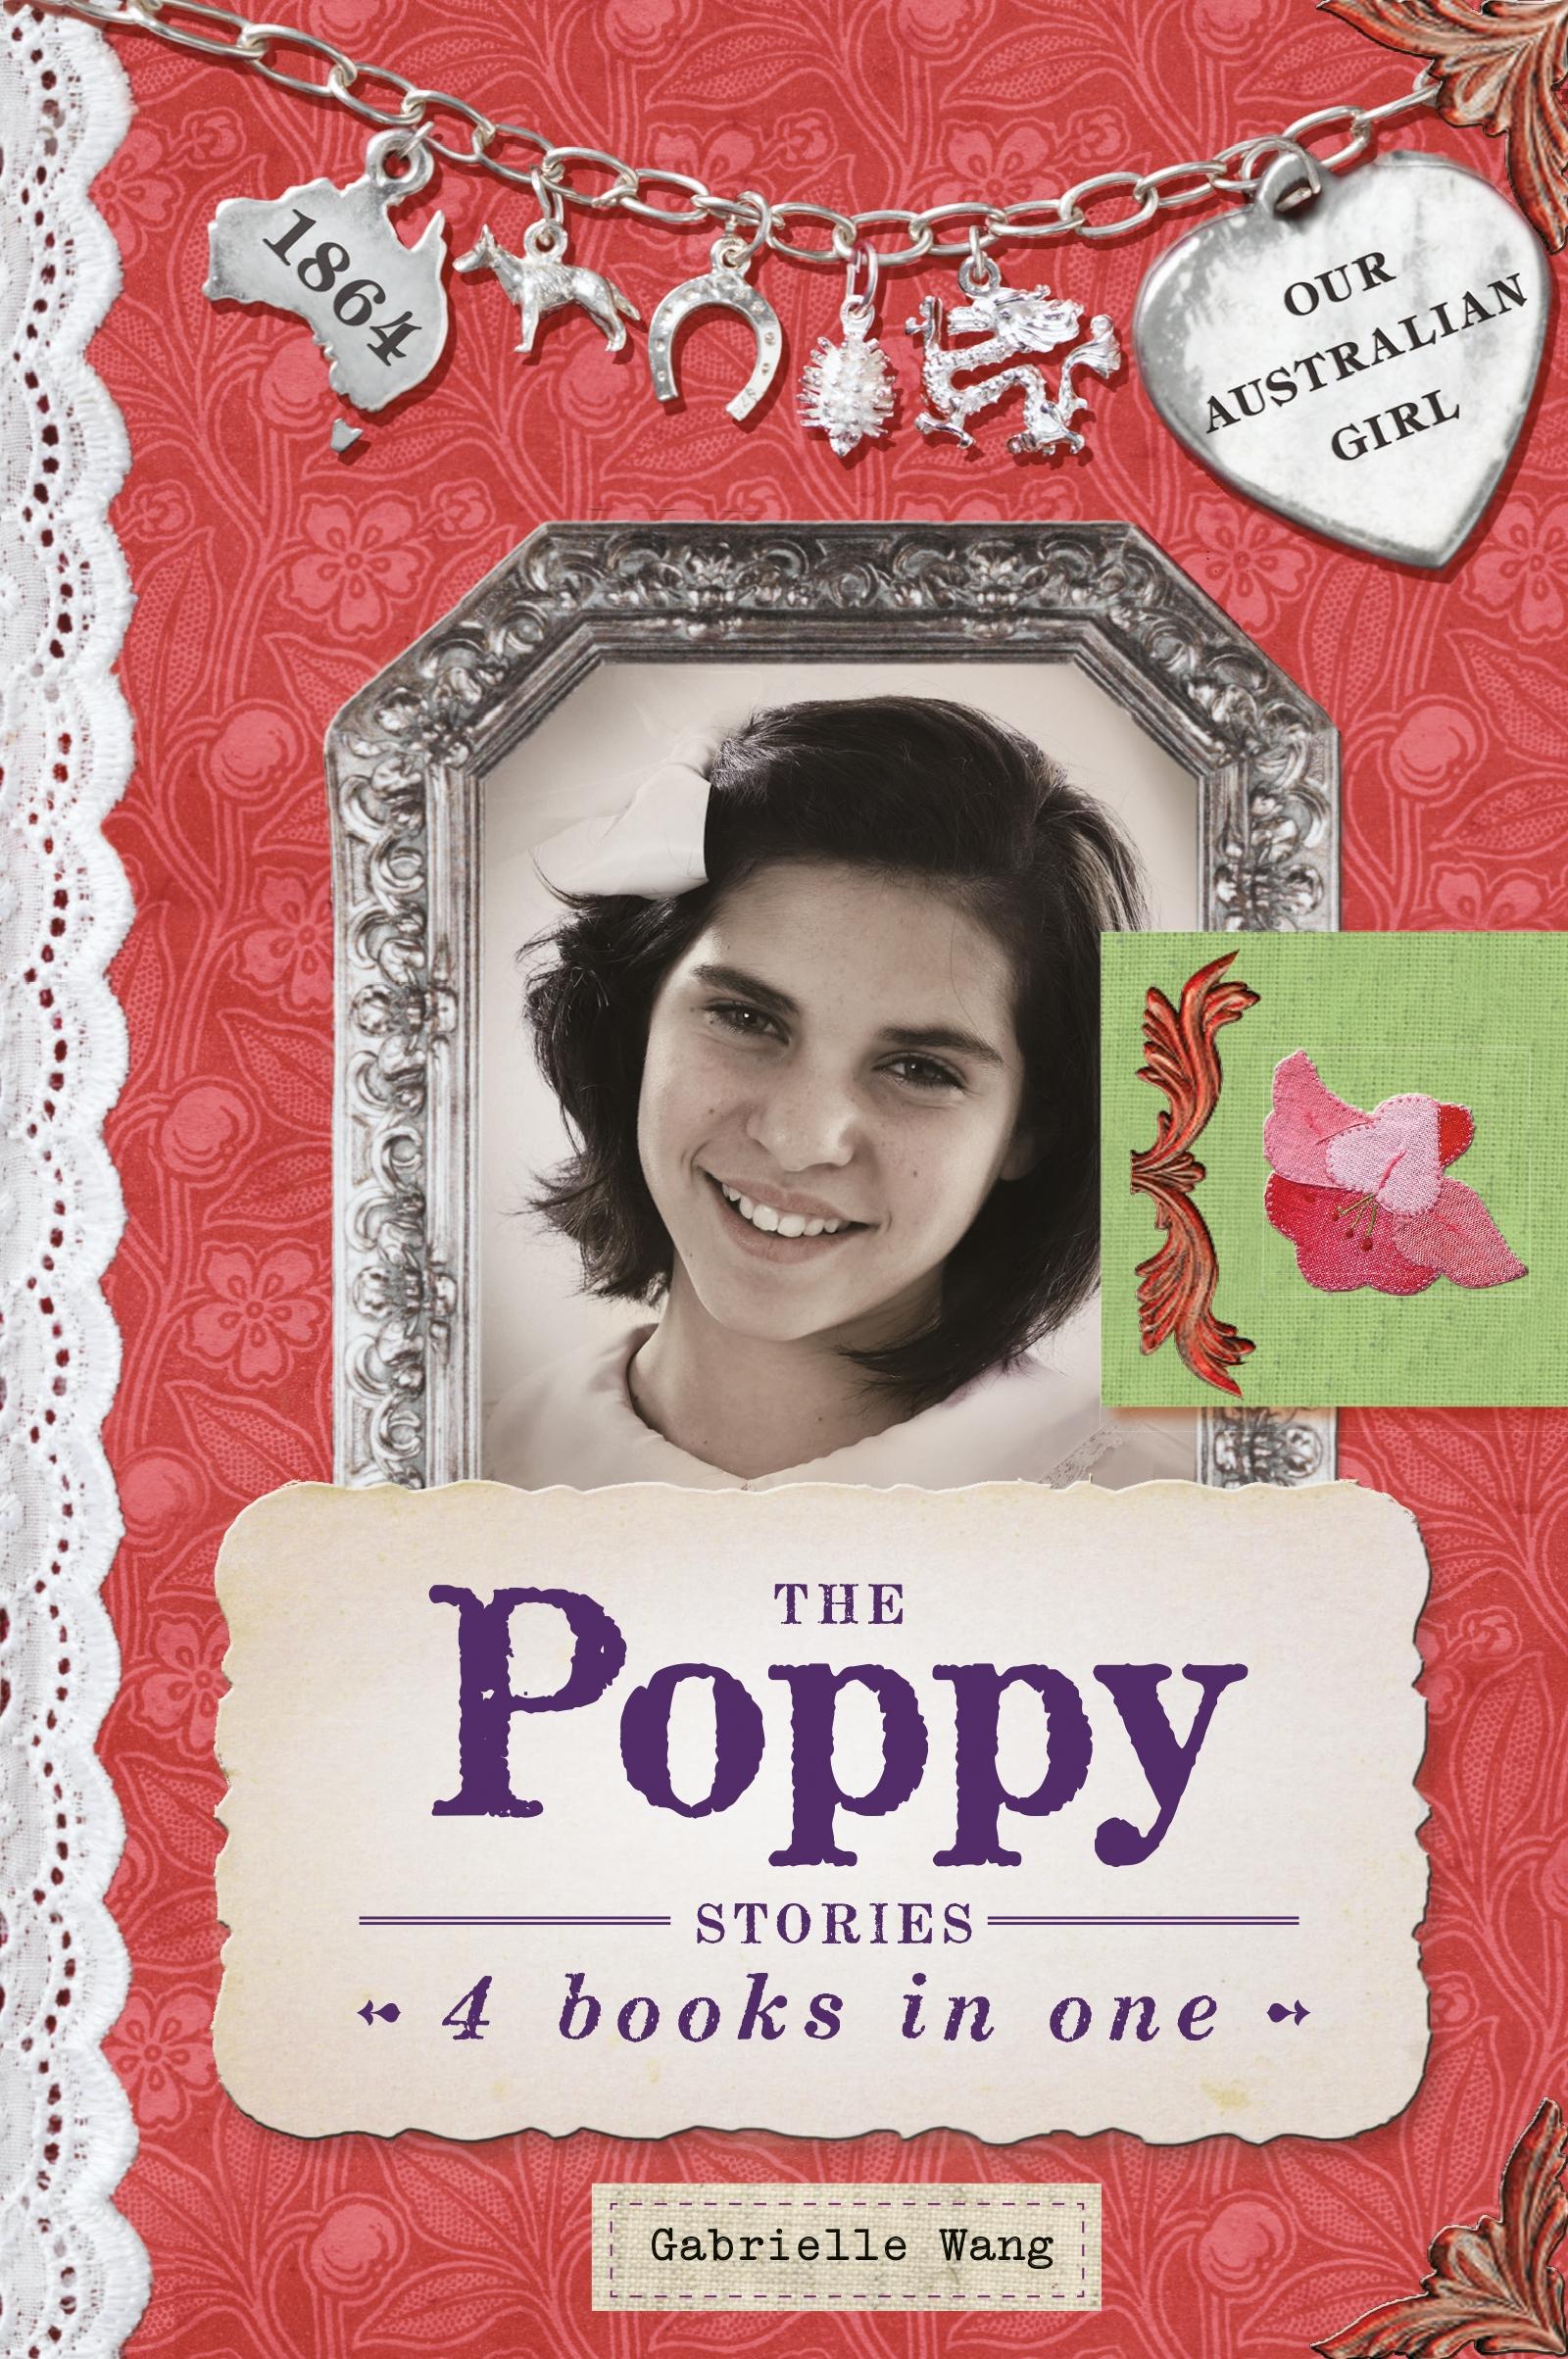 The Poppy Stories